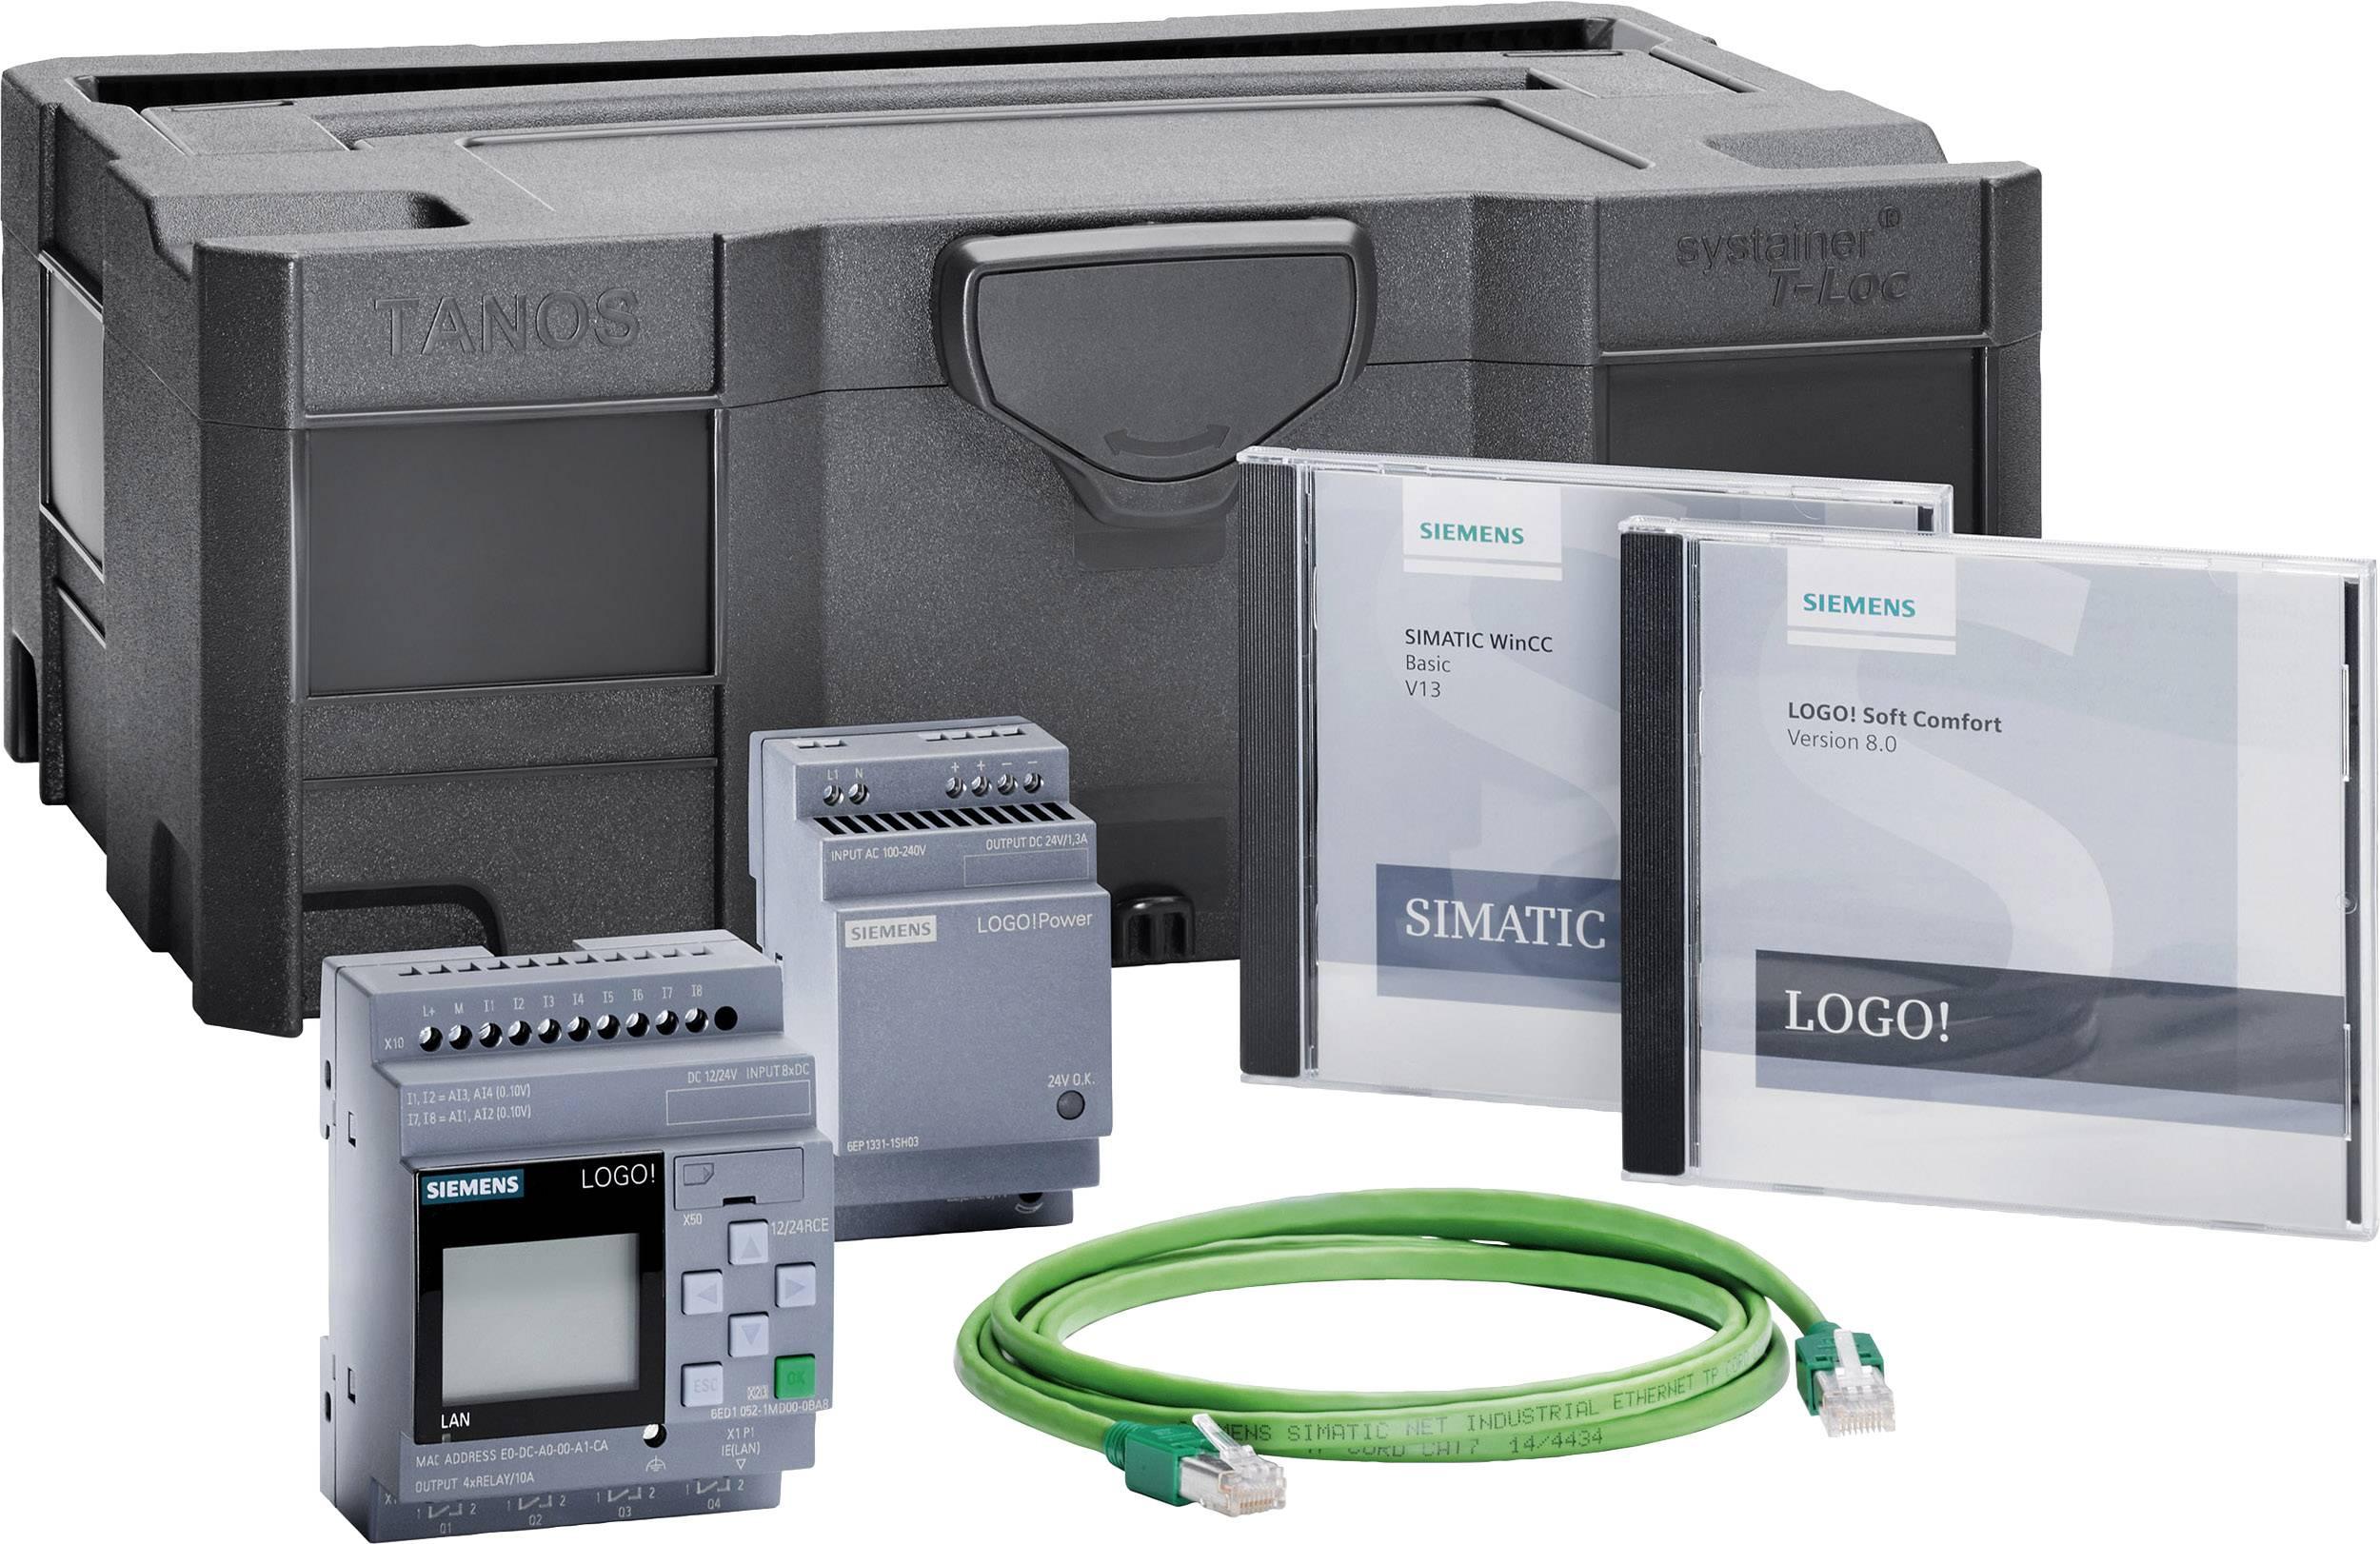 Startovací sada pro PLC Siemens LOGO! STARTER KIT 12/24RCE 6ED1057-3BA01-0AA8, 12 V/DC, 24 V/DC